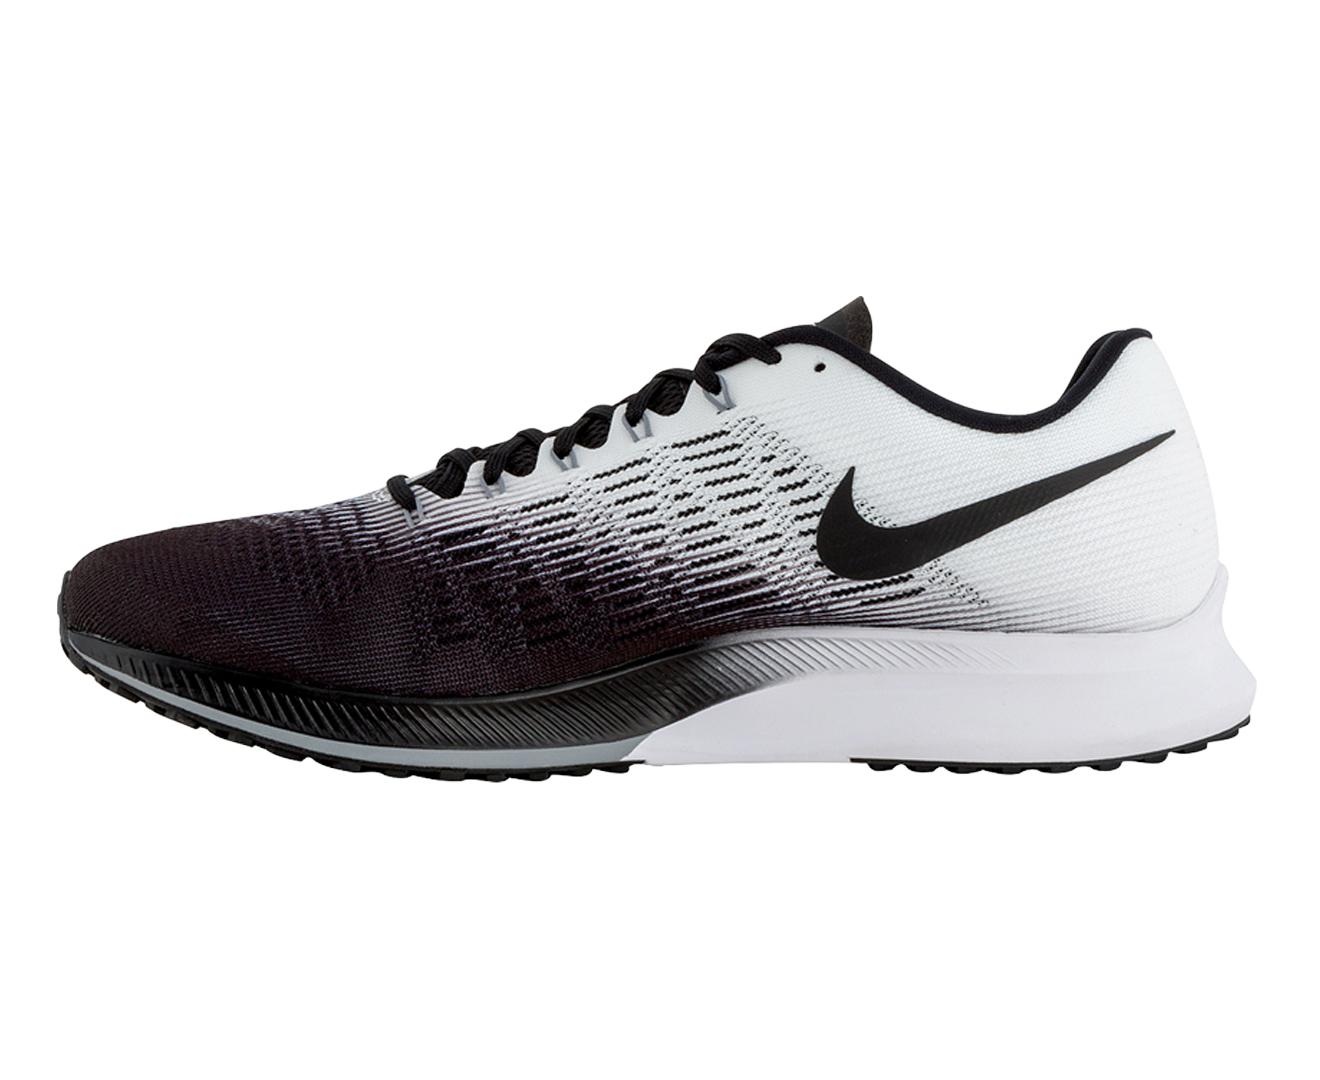 Nike Men's Air Zoom Elite 9 Shoe BlackWhite Stealth